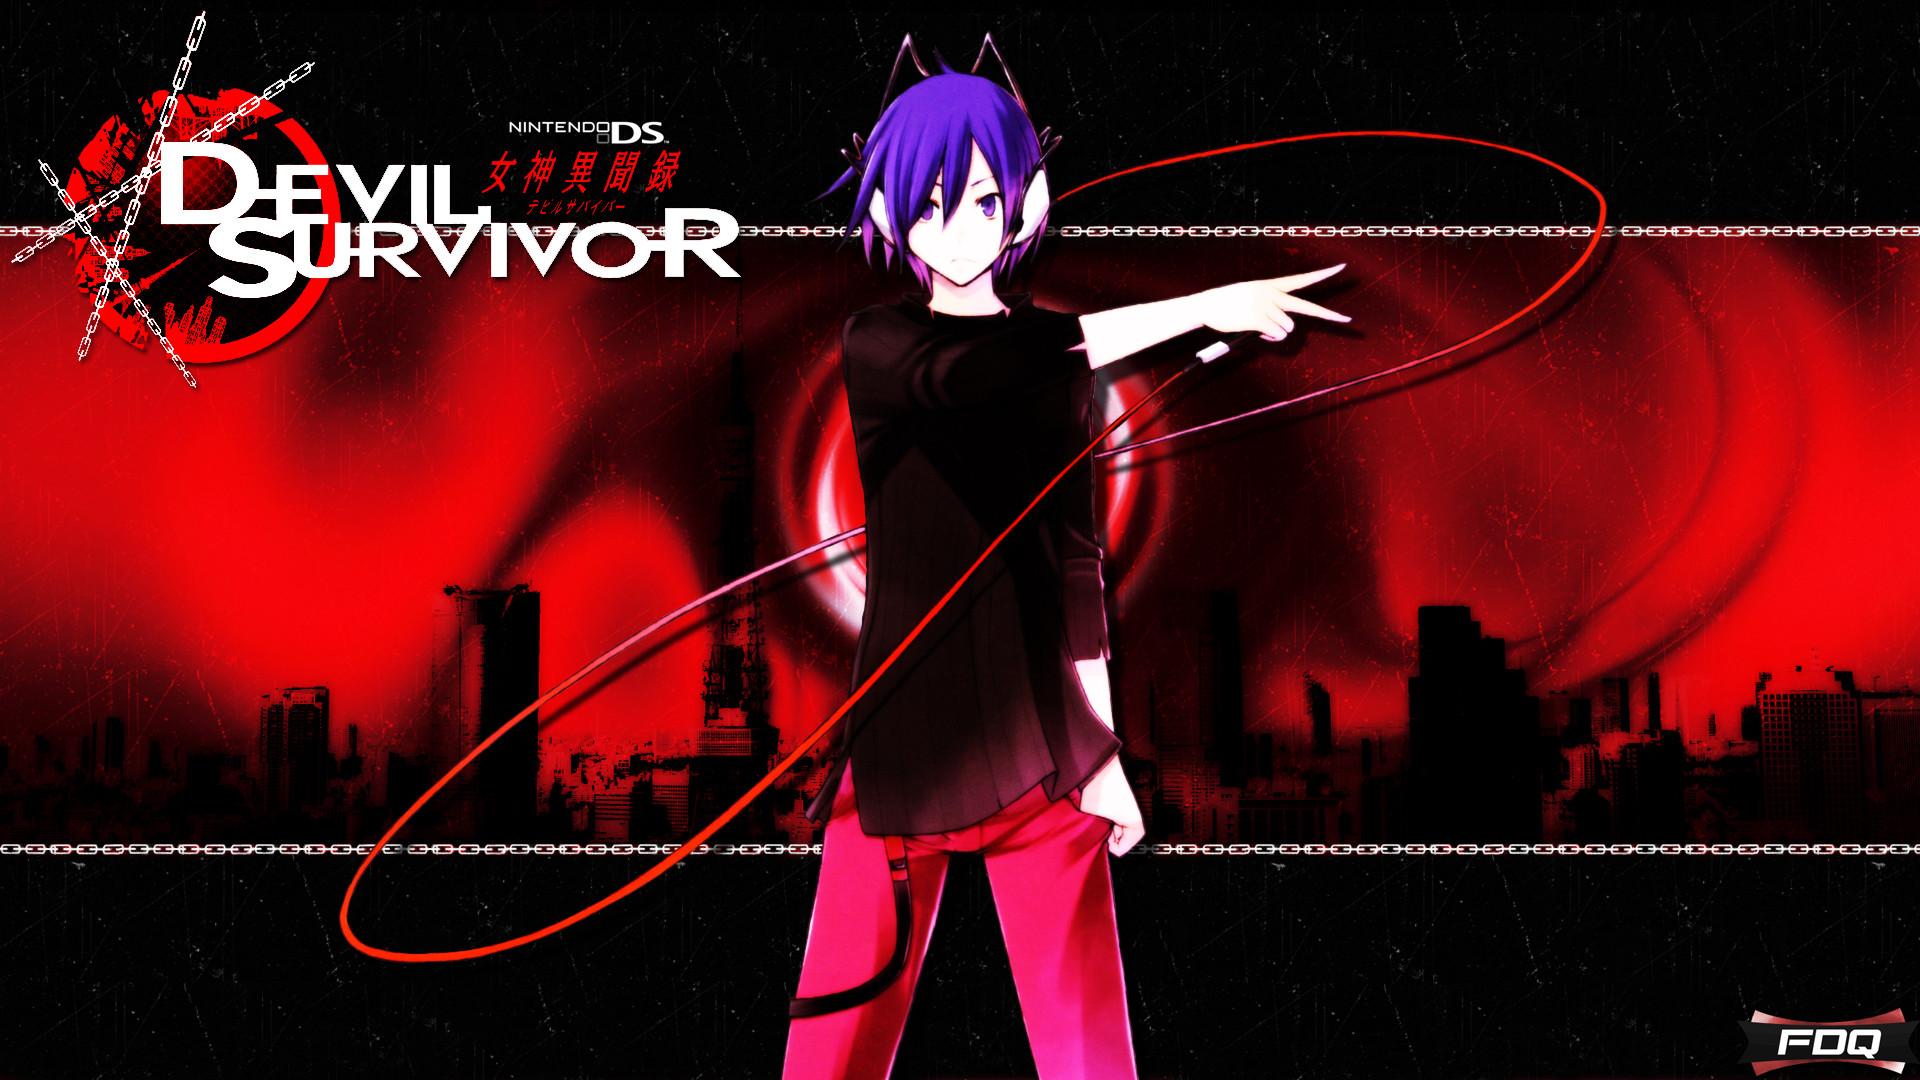 Shin Megami Tensei Devil Survivor q wallpaper     82858    WallpaperUP